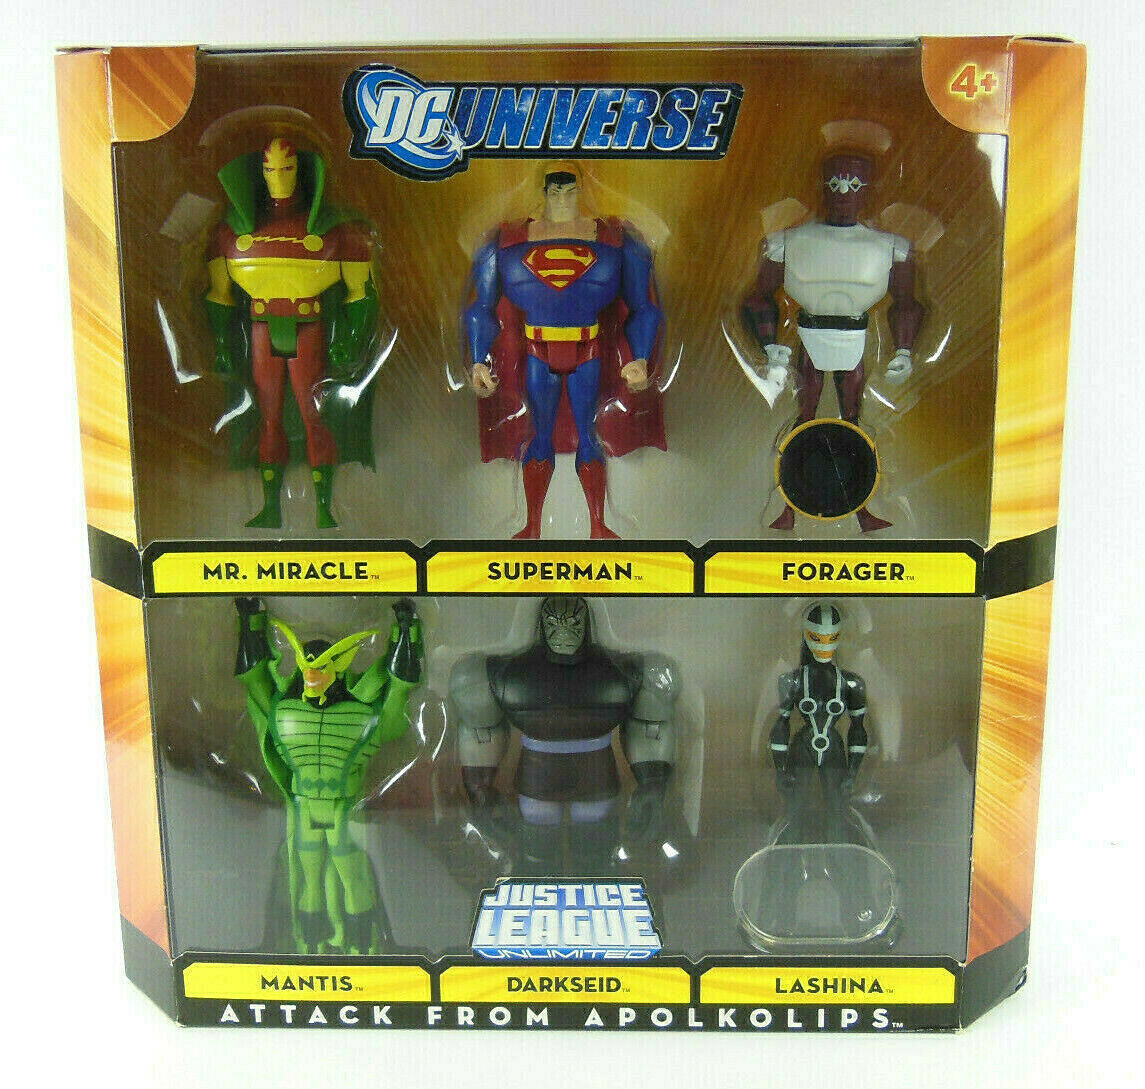 DC Universo ataque de apolkolips; súperman, Darkseid, Lashina, Mantis, más